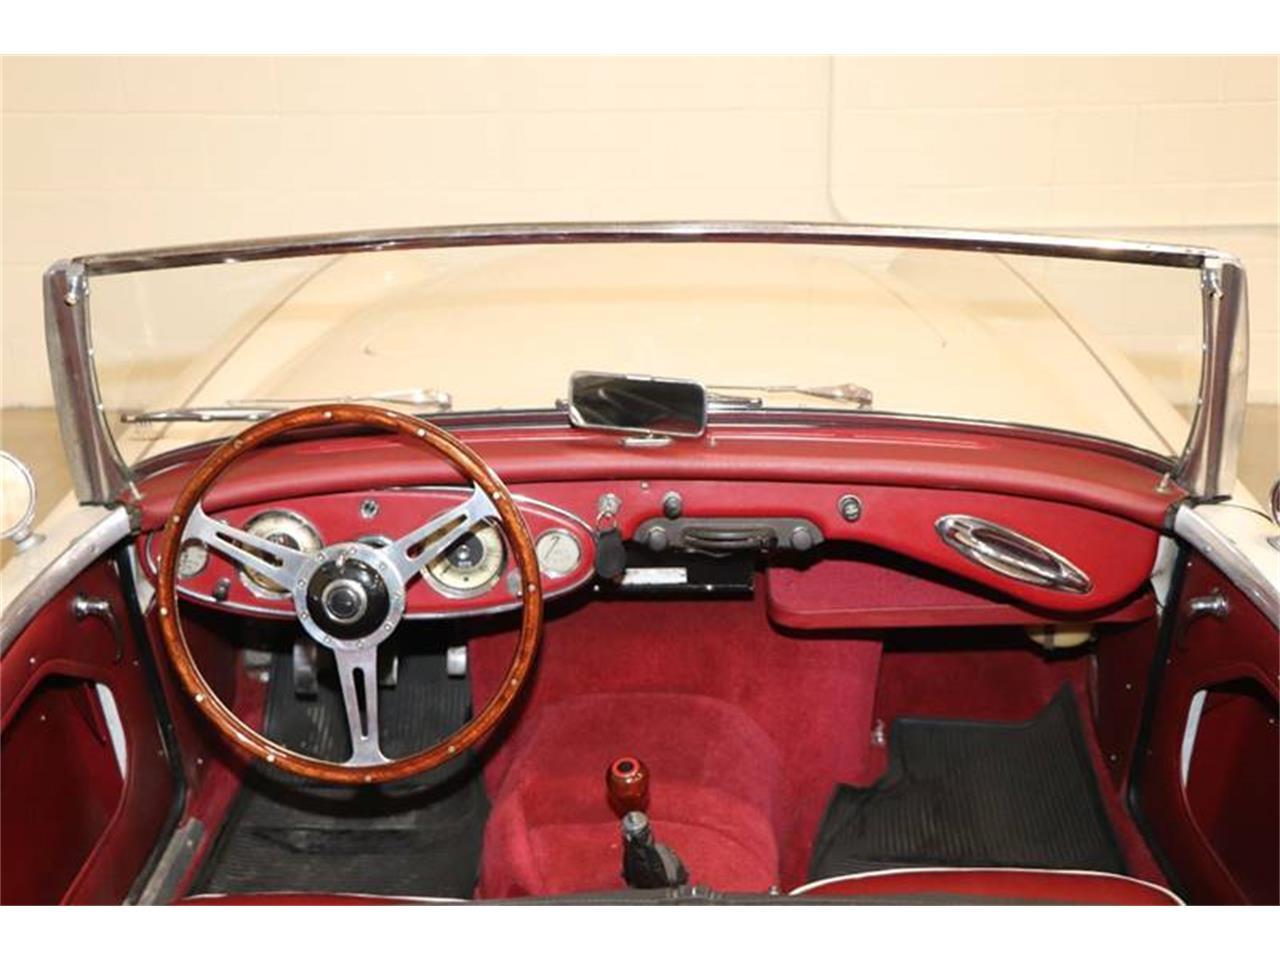 1962 Austin-Healey 3000 (CC-1151750) for sale in St Louis, Missouri